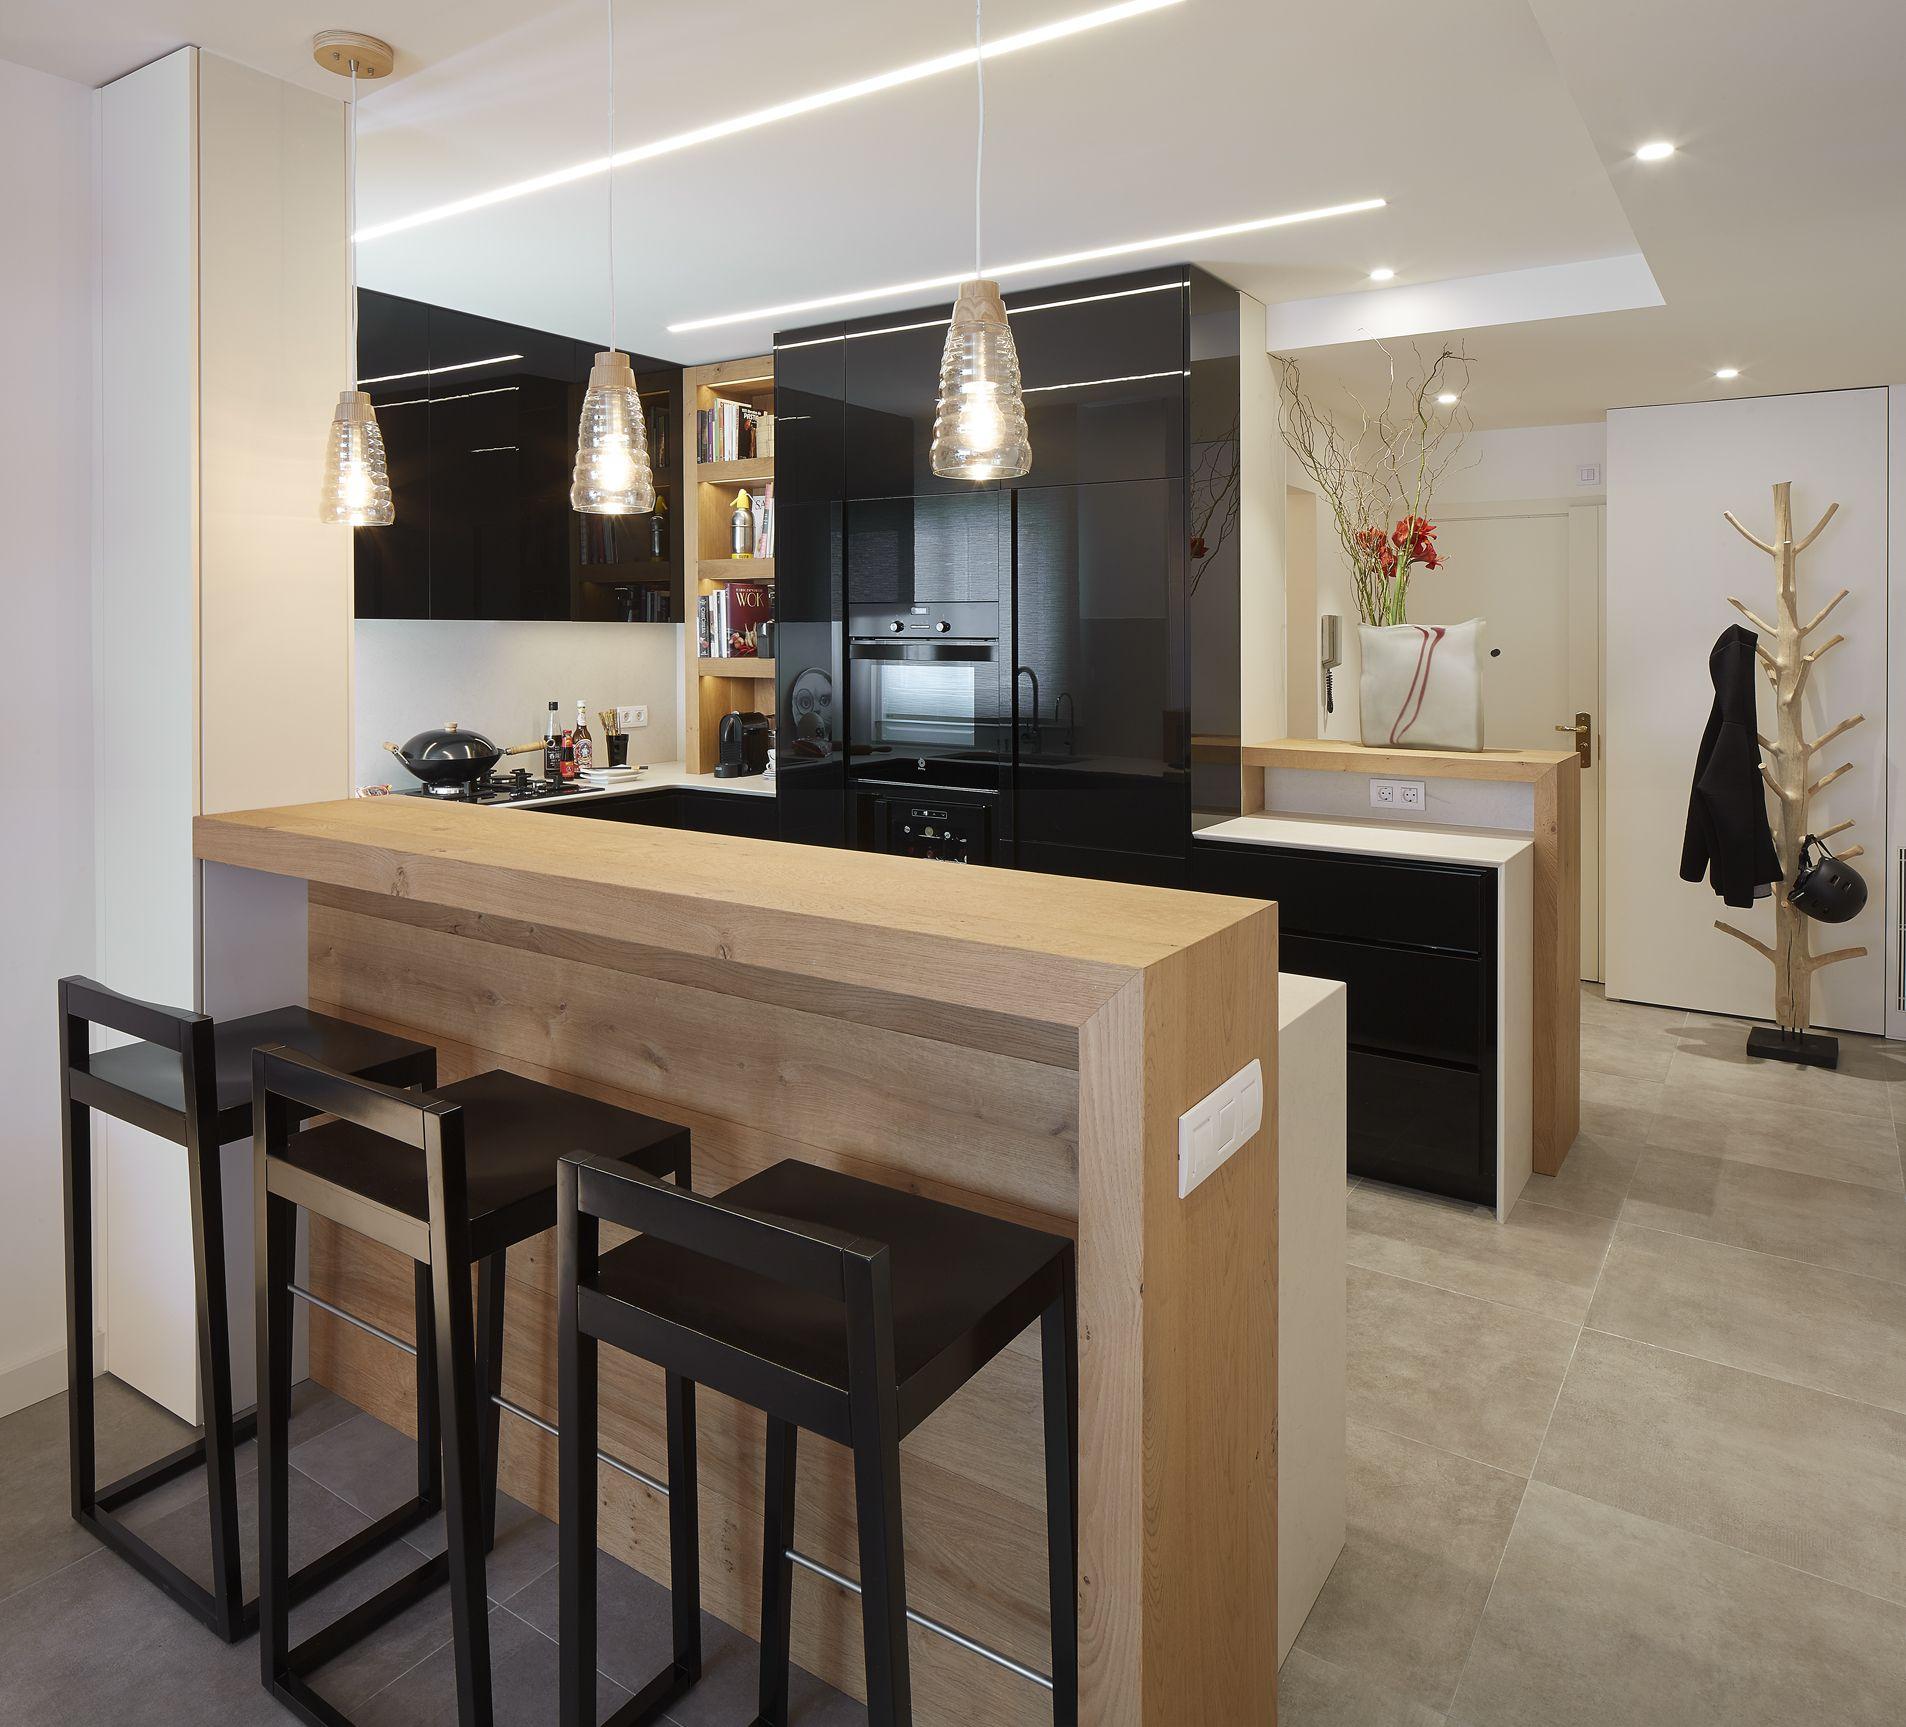 Molins interiors arquitectura interior interiorismo for Barras de cocina modernas